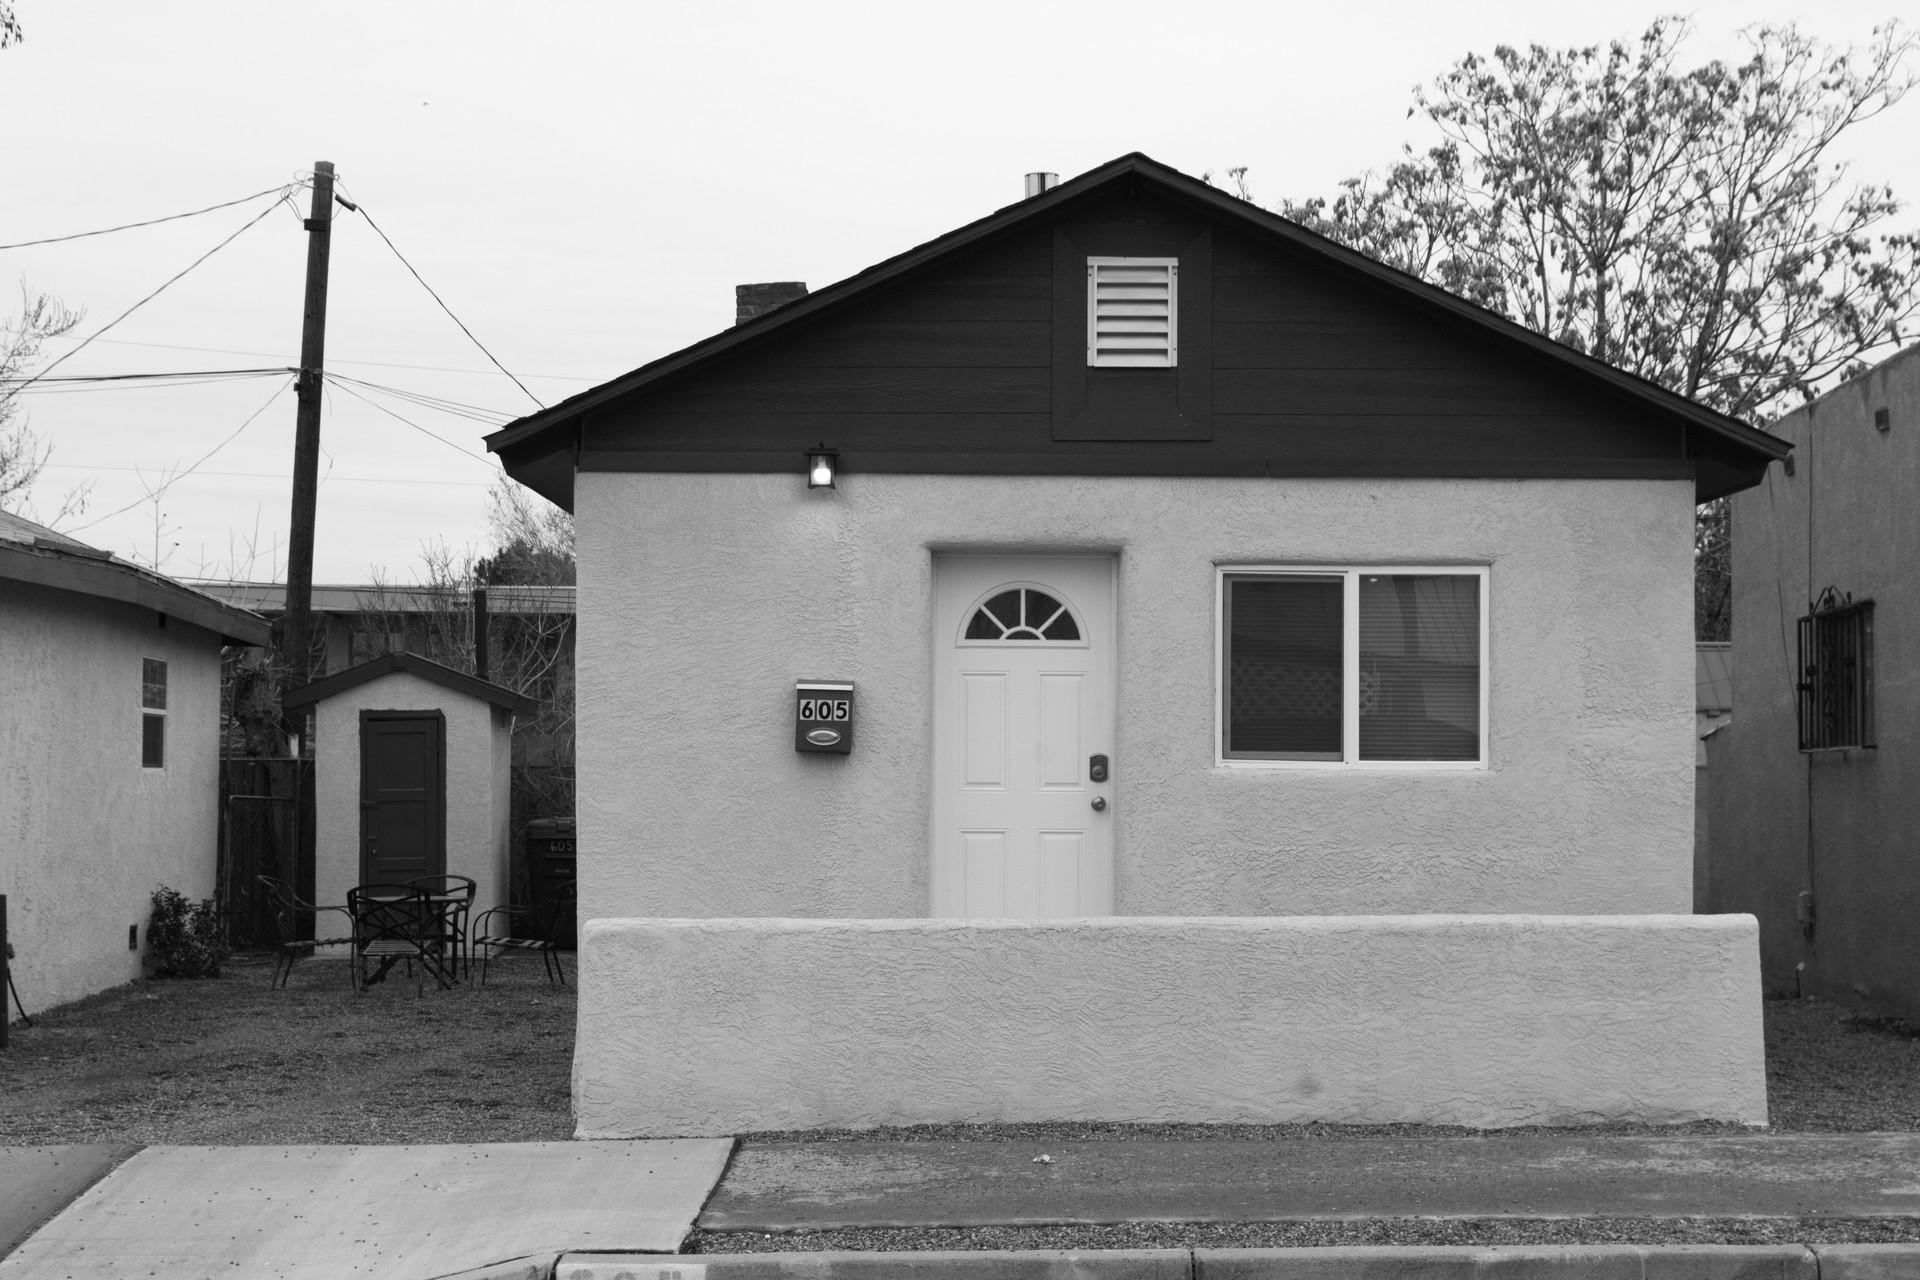 House 1, NM, US